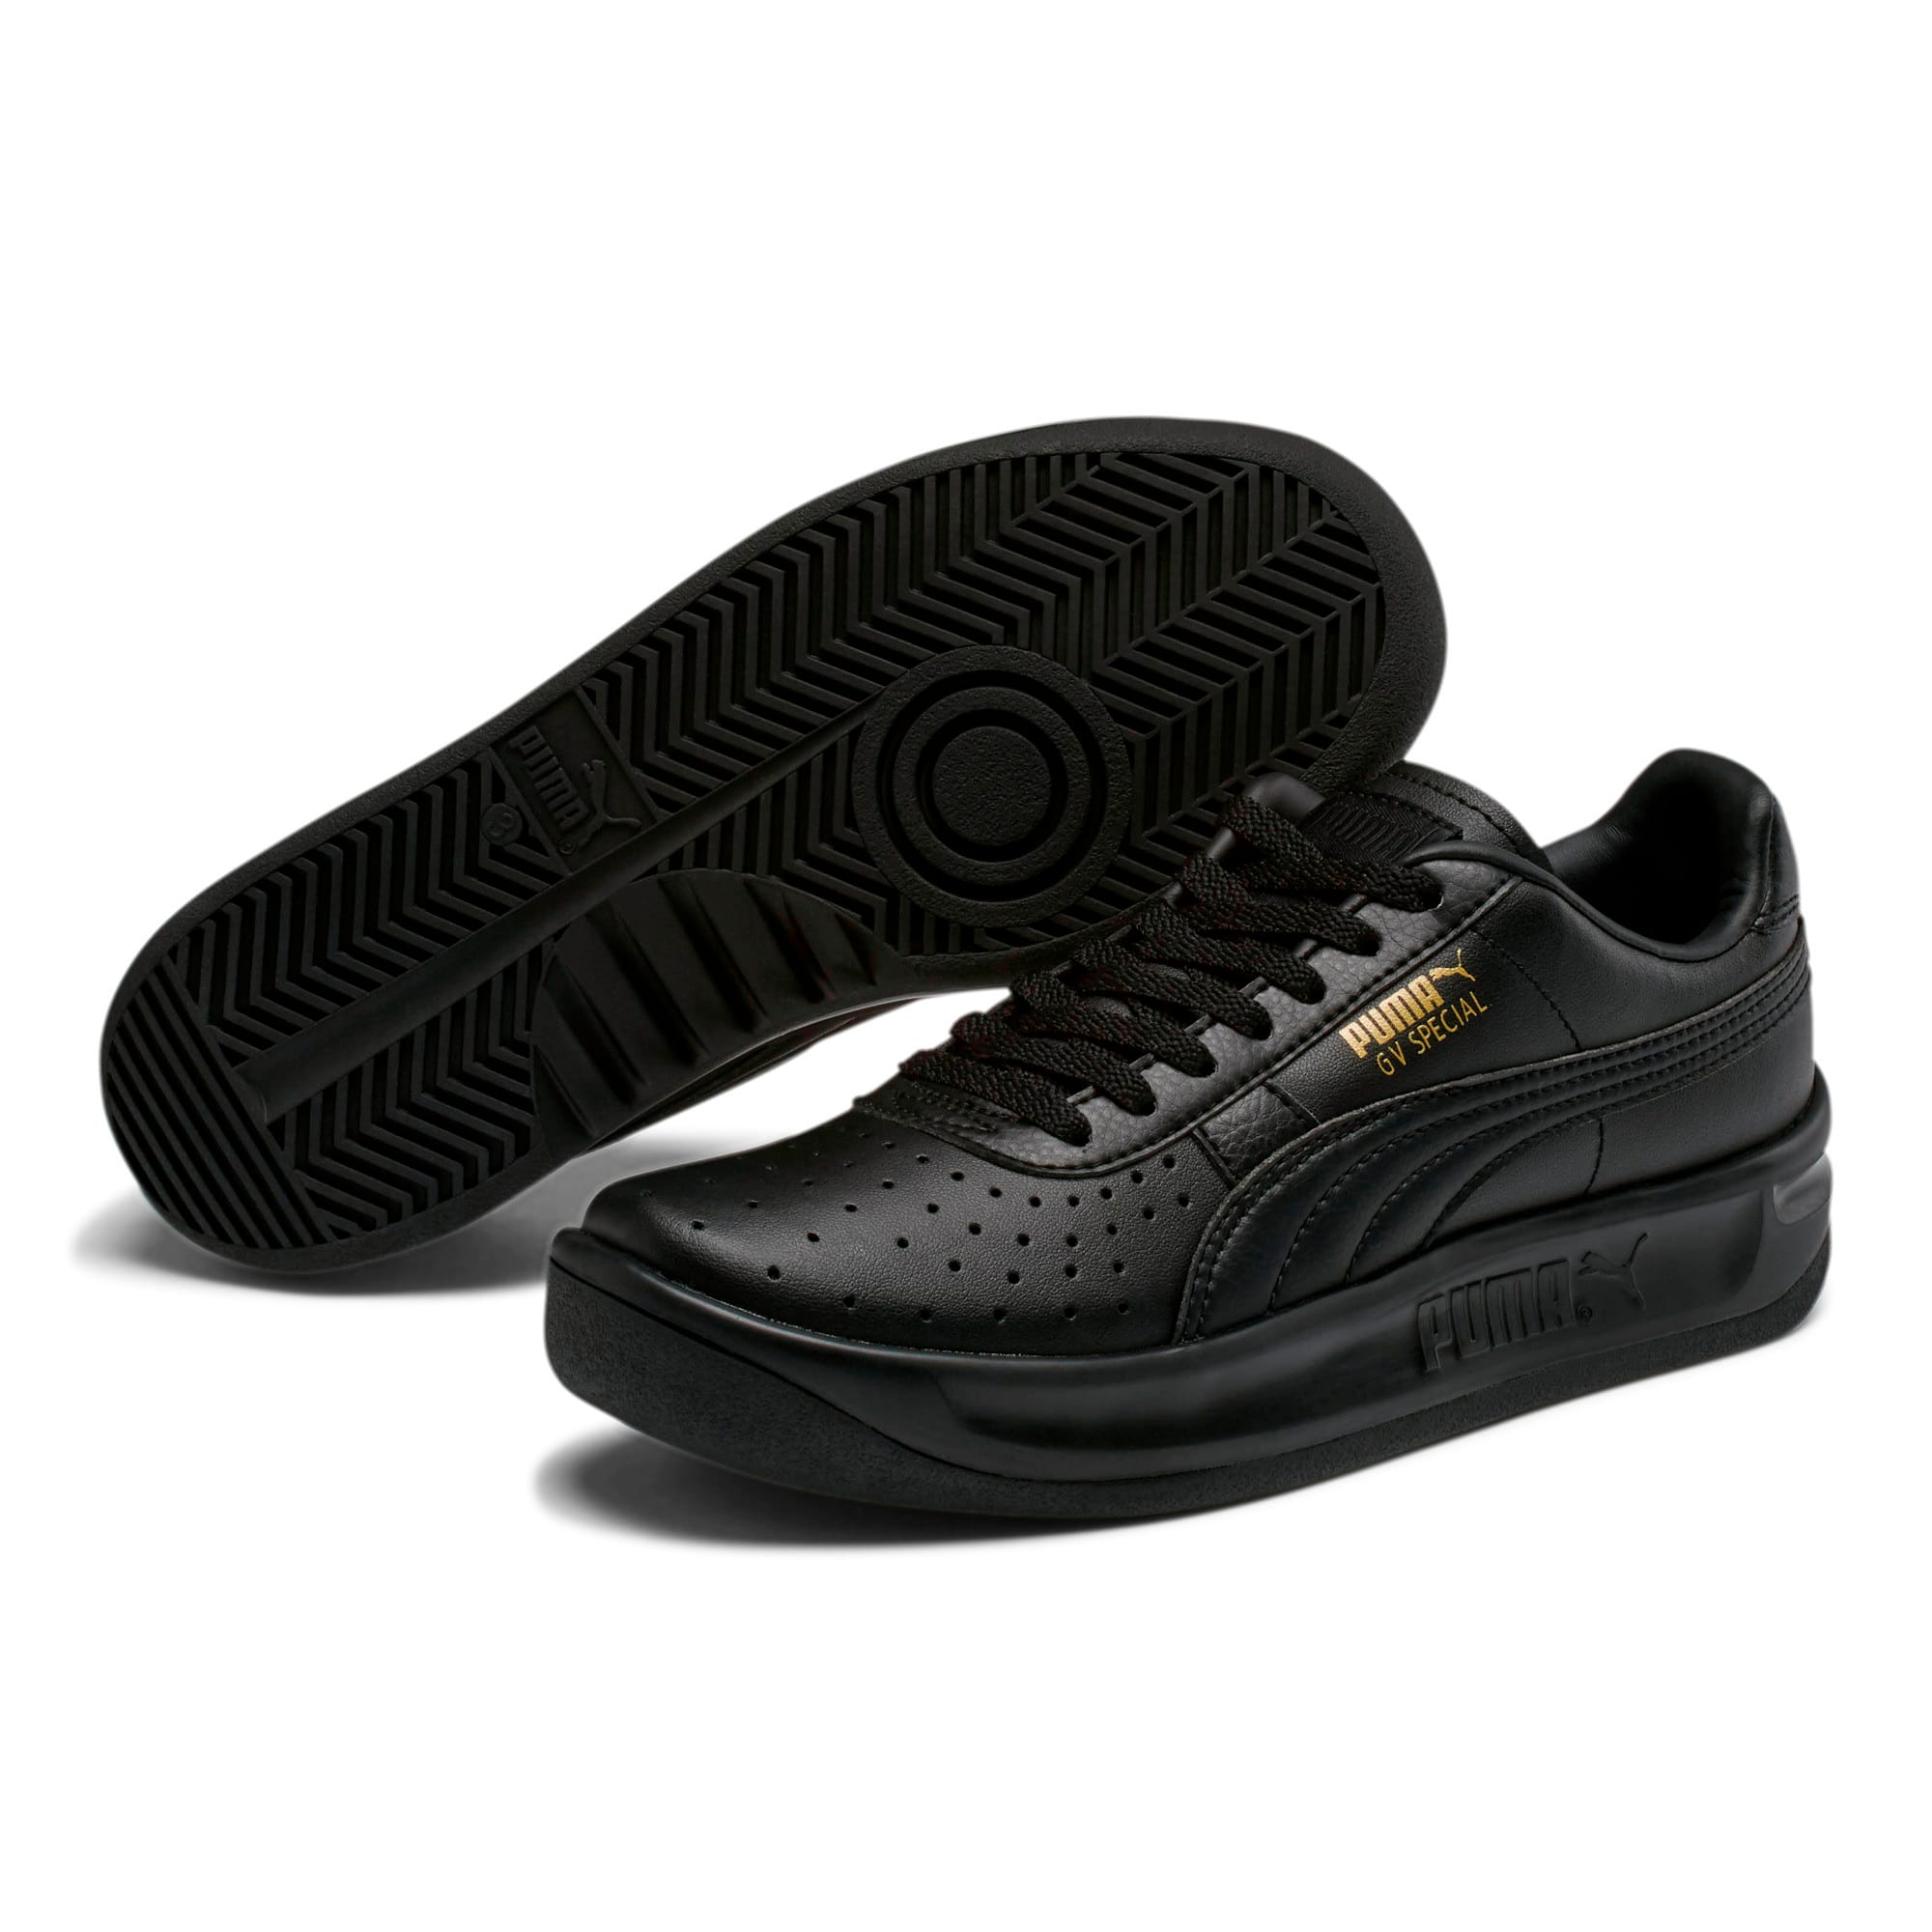 Thumbnail 2 of GV Special Sneakers JR, Puma Black-Puma Team Gold, medium